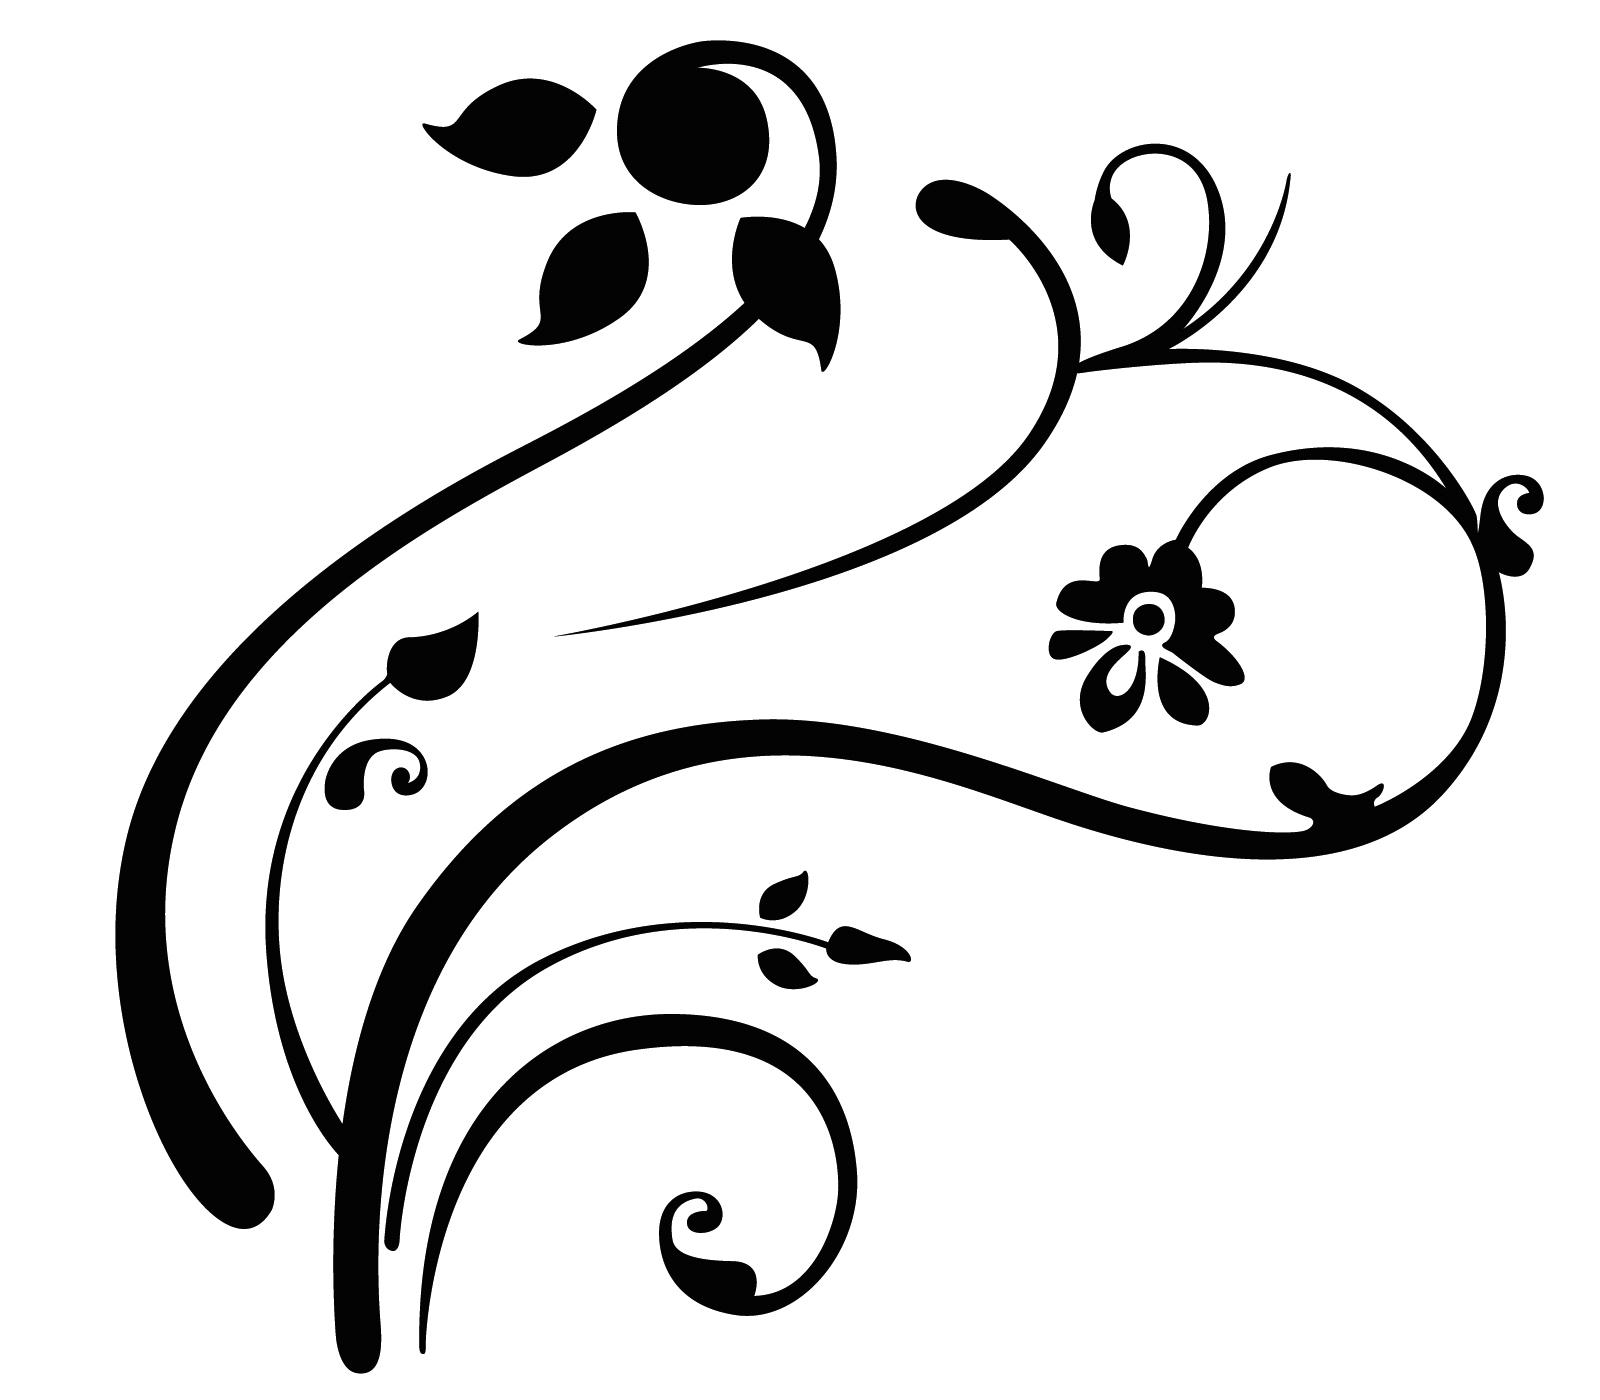 1600x1400 Swirl Designs Clip Art Free